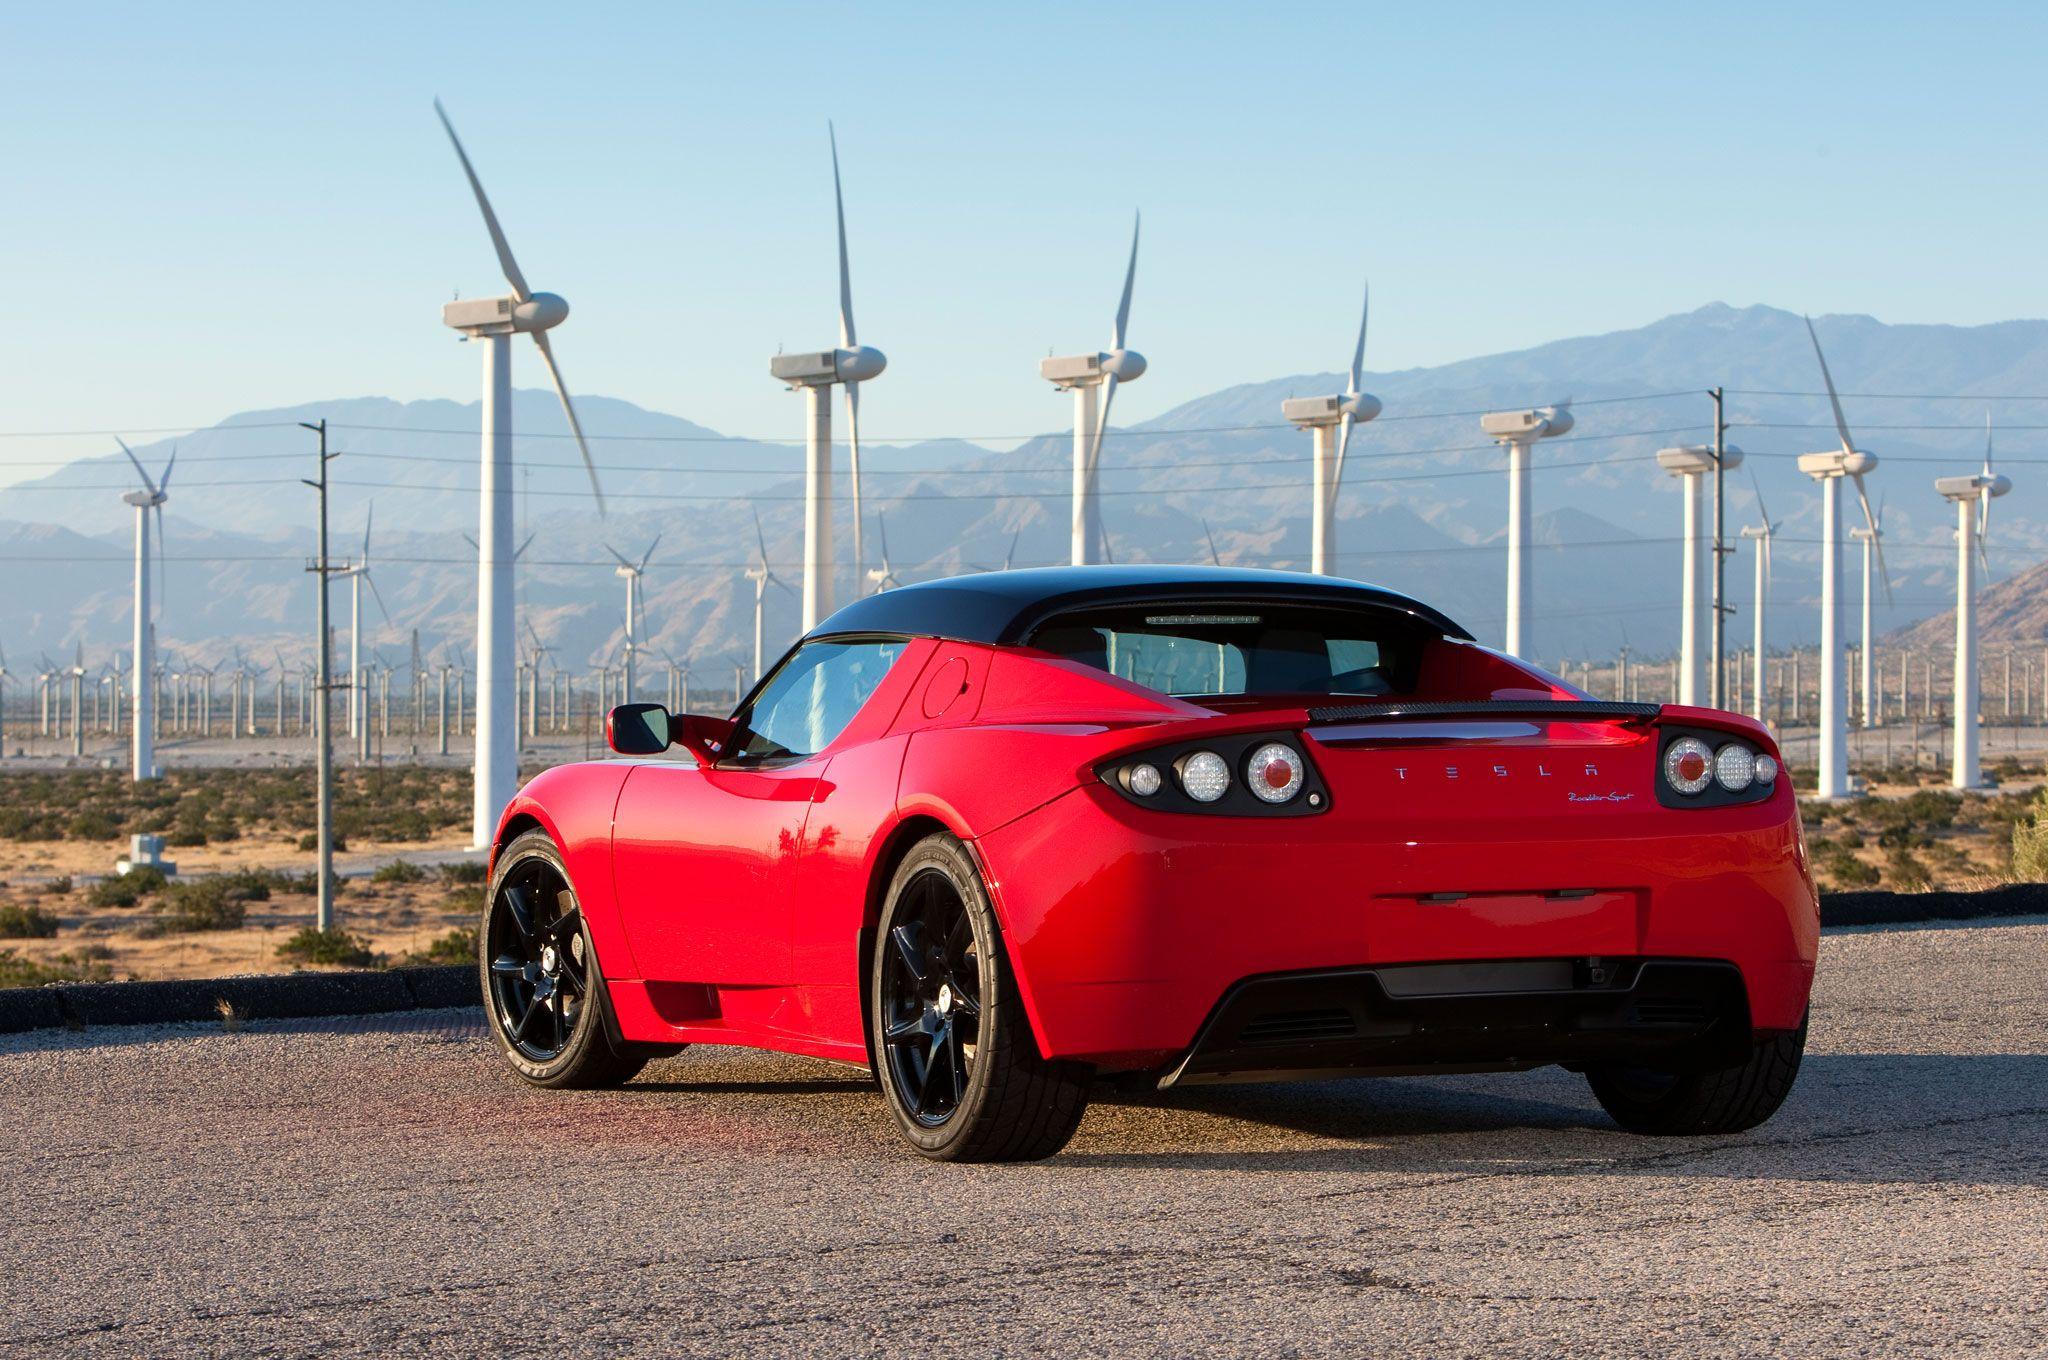 New Tesla Roadster Planned Says Elon Musk Tesla Roadster New Tesla Roadster Roadsters